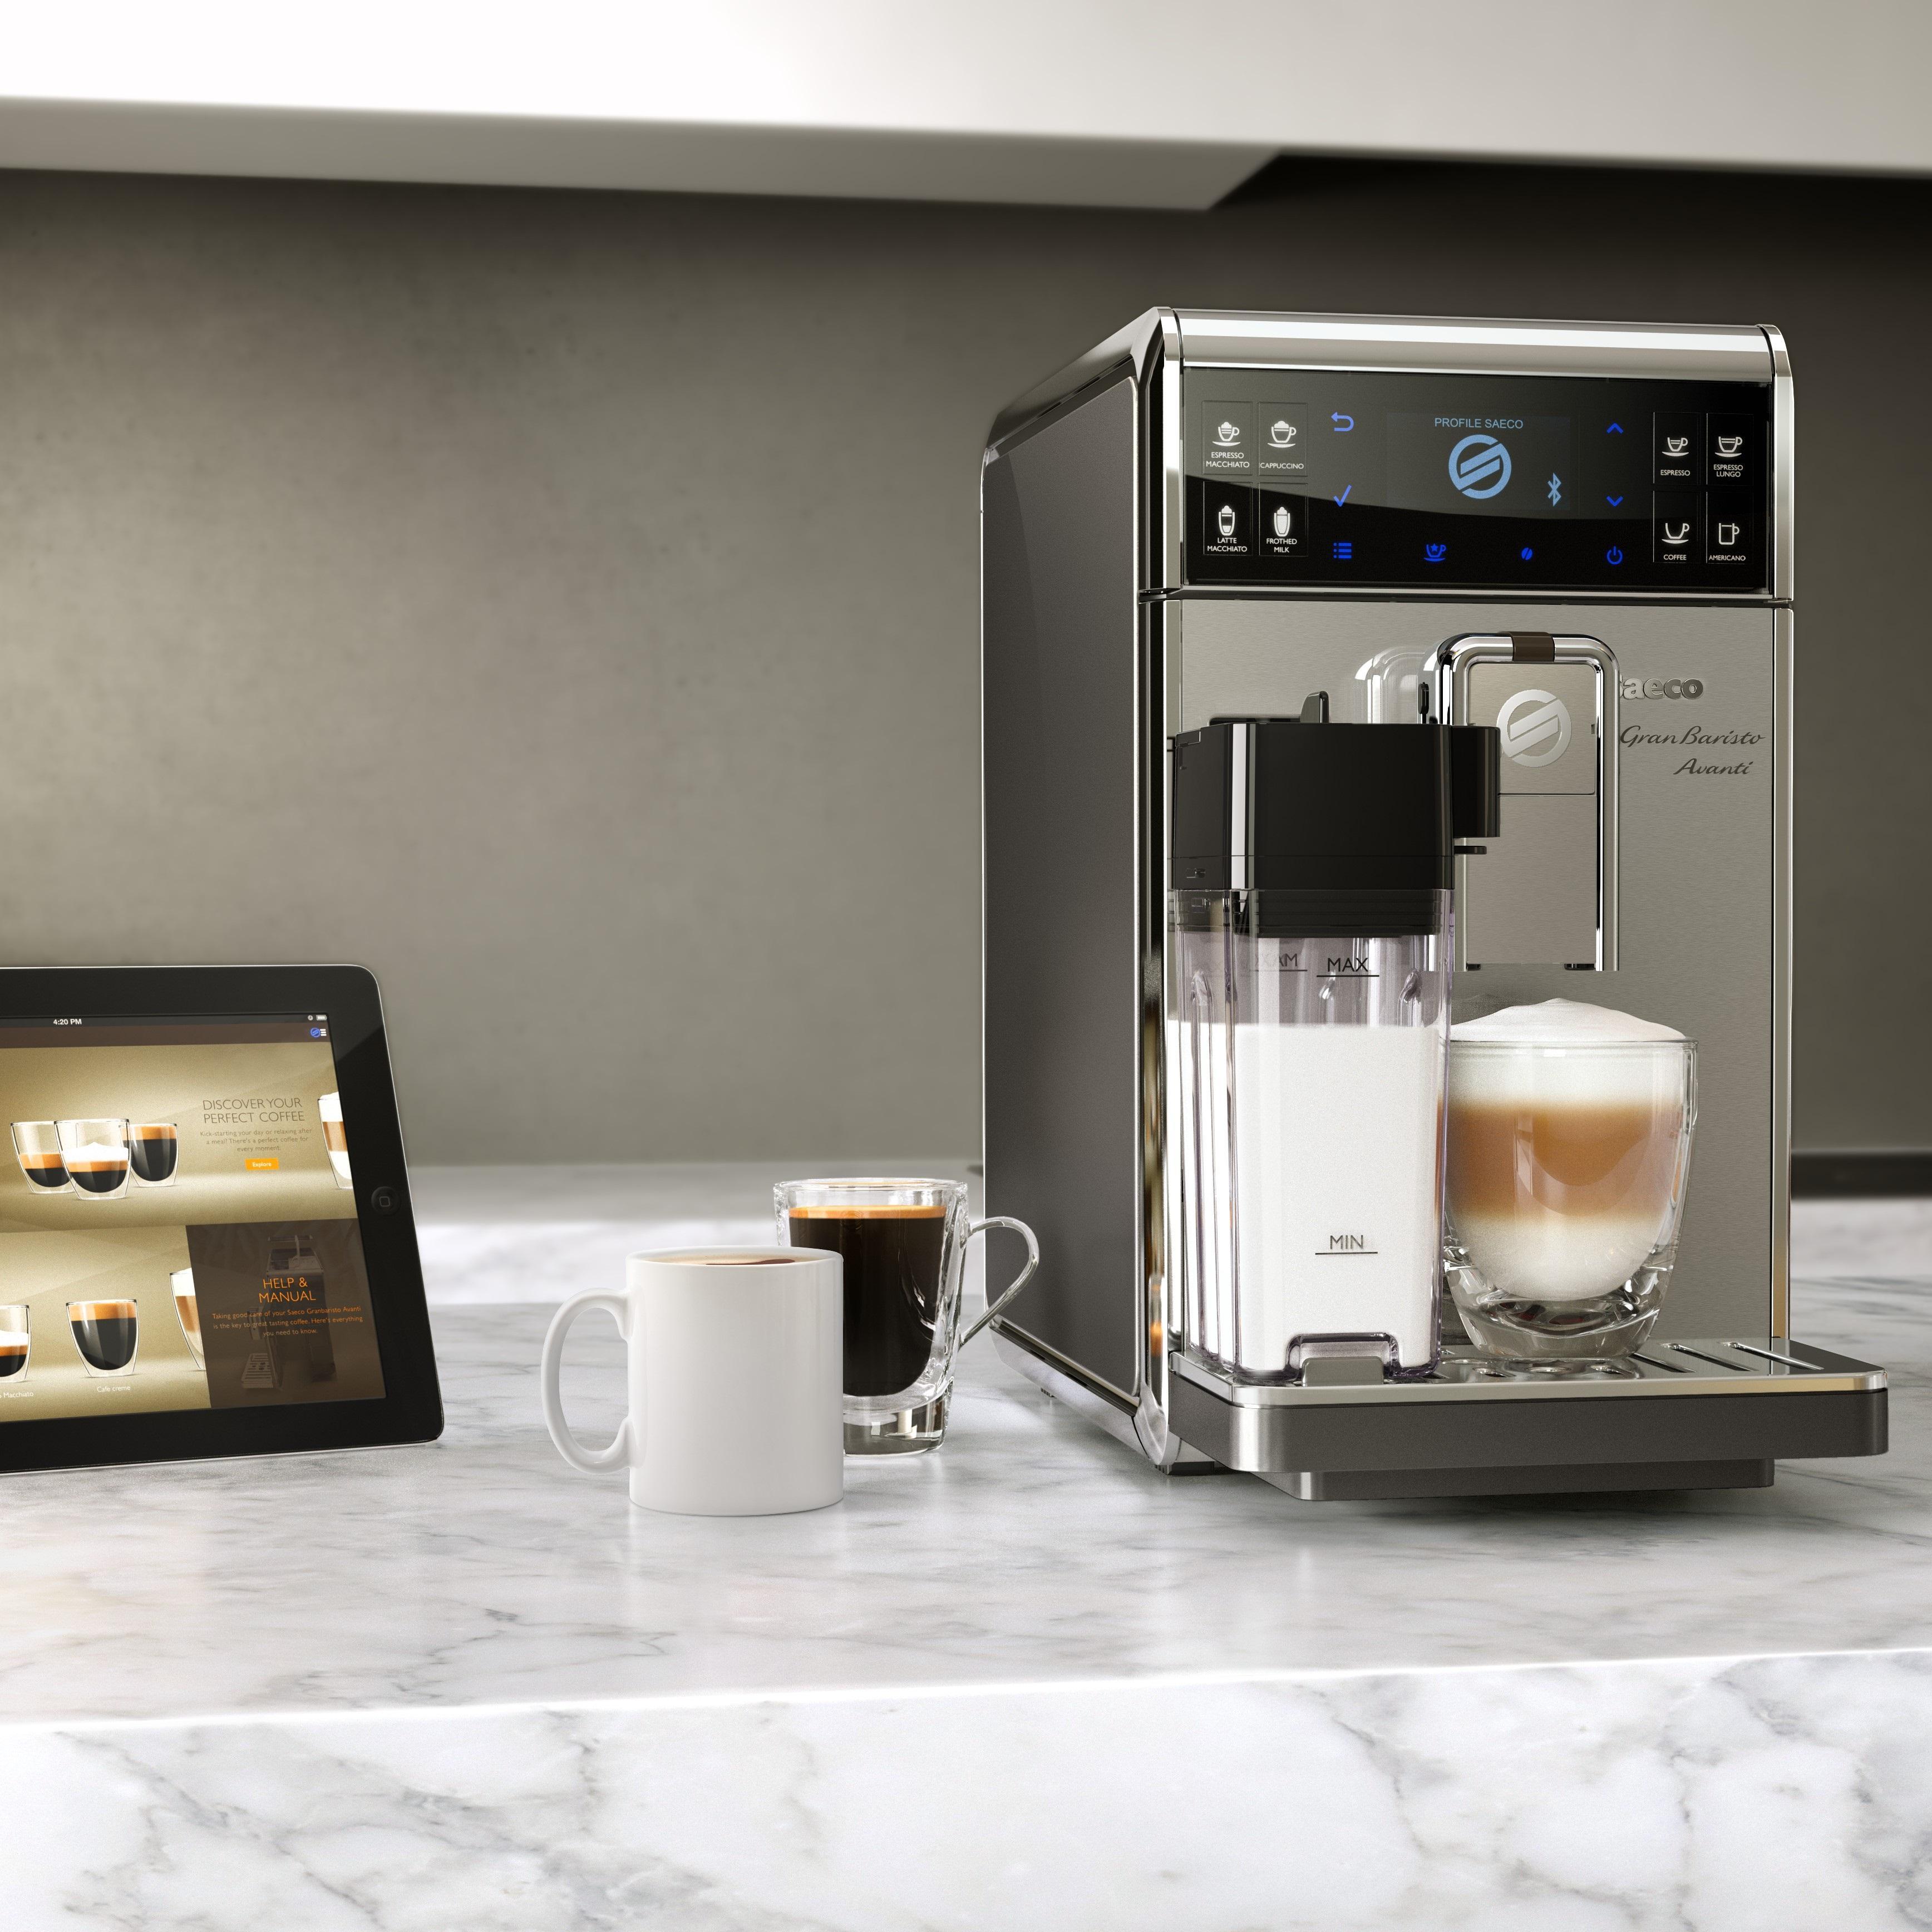 selten benutzter saeco granbaristo avanti hd 8967 01 kaffeevollautomat 8710103646723 ebay. Black Bedroom Furniture Sets. Home Design Ideas